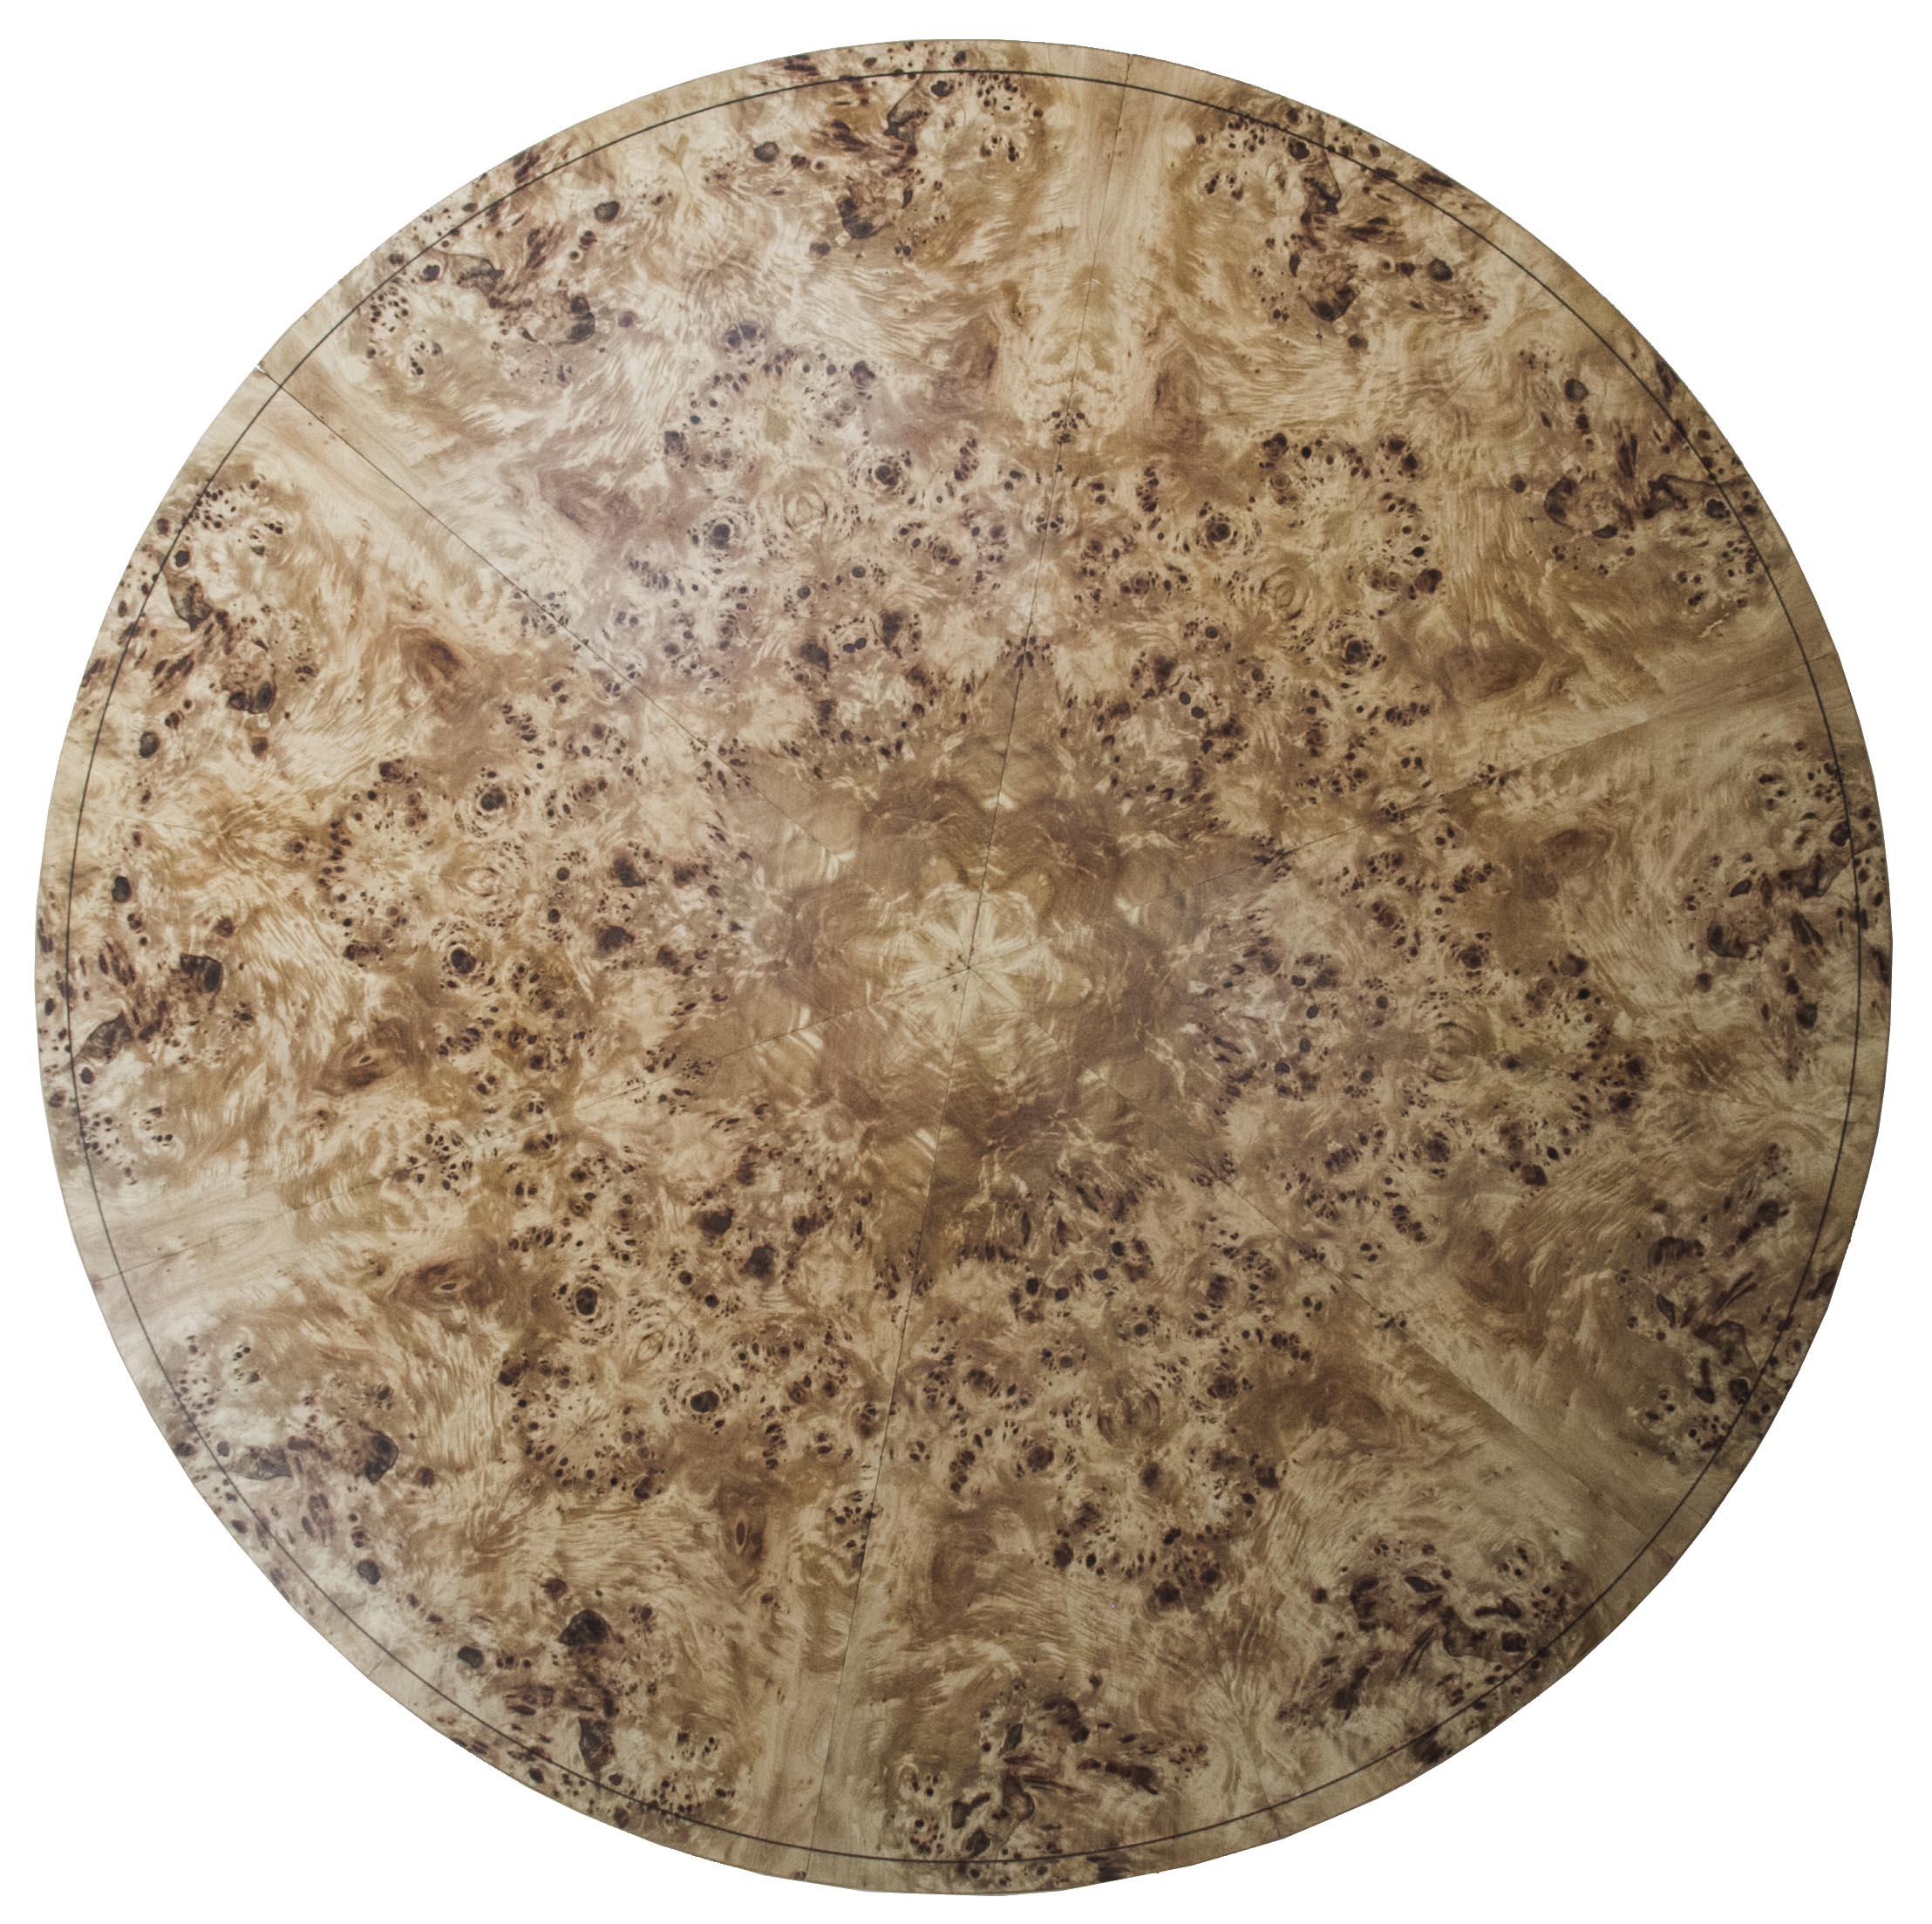 Johnson Furniture - Burr poplar and elm dining table 05.jpg